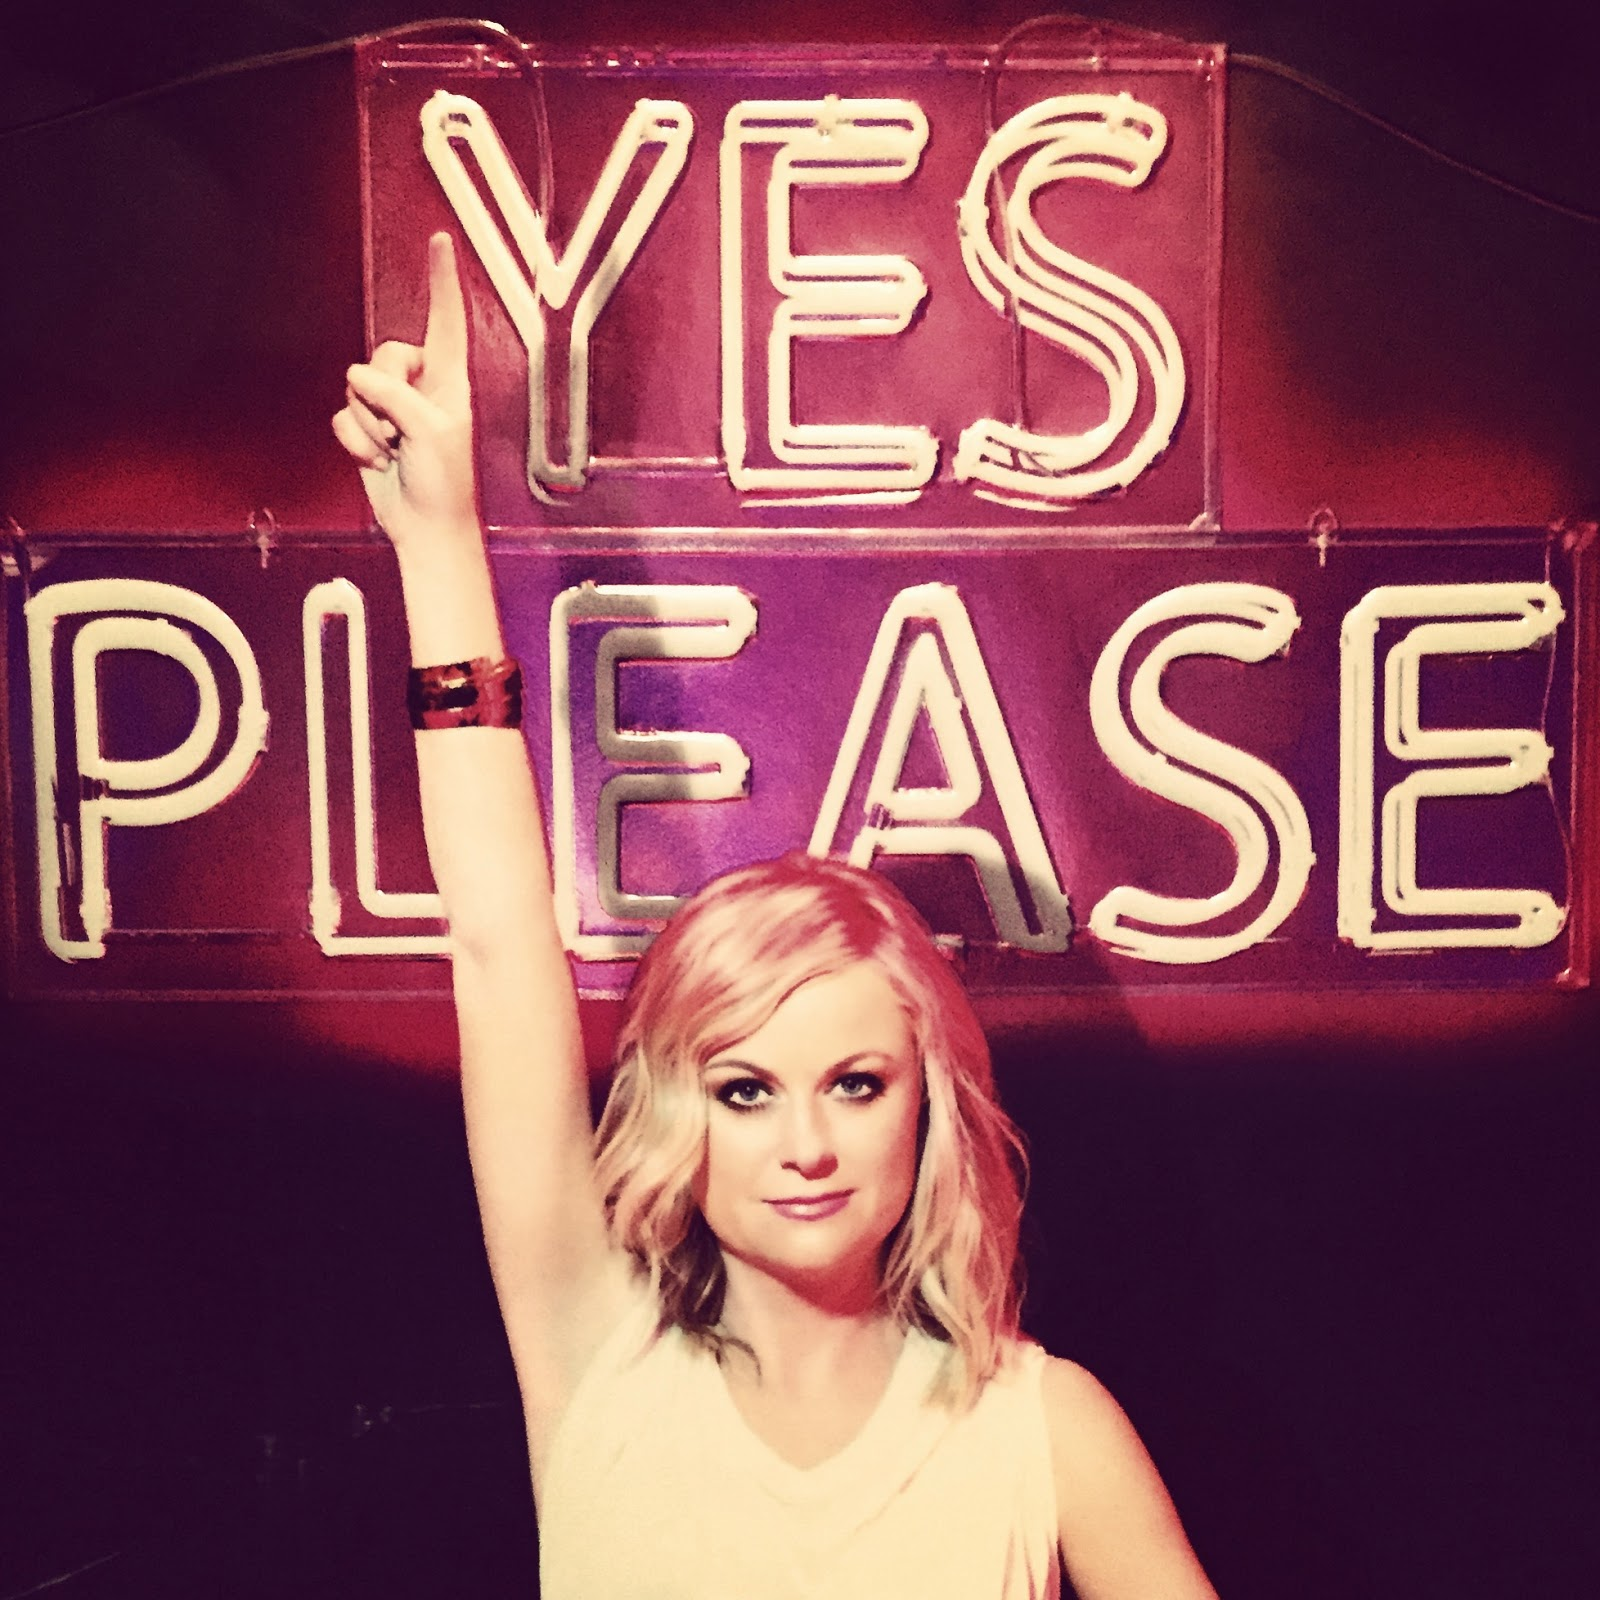 Amy Poehler's Yes Please